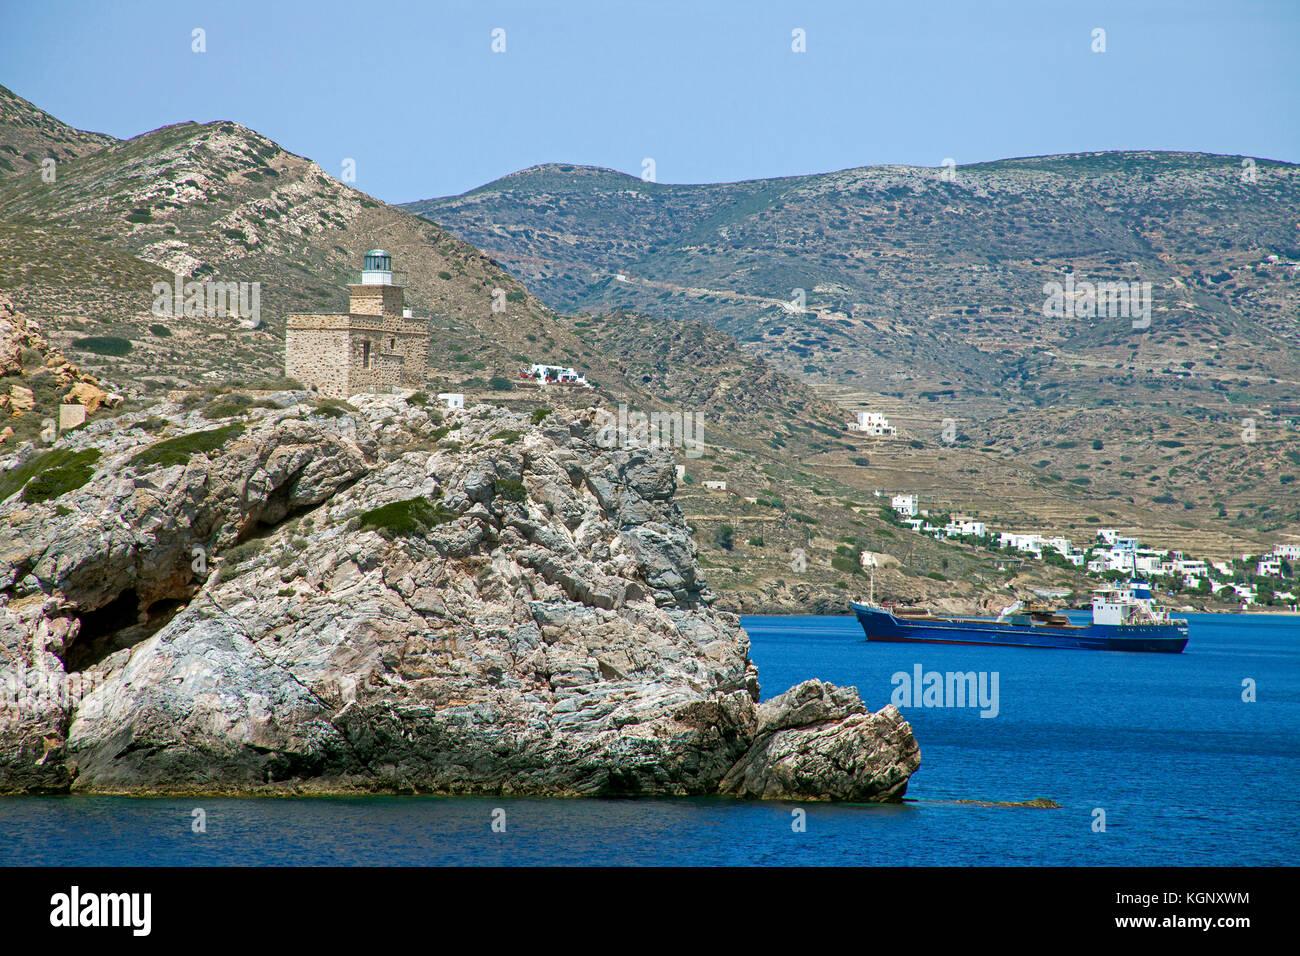 Lighthouse and coast landscape at Paros island, Cyclades, Aegean, Greece - Stock Image